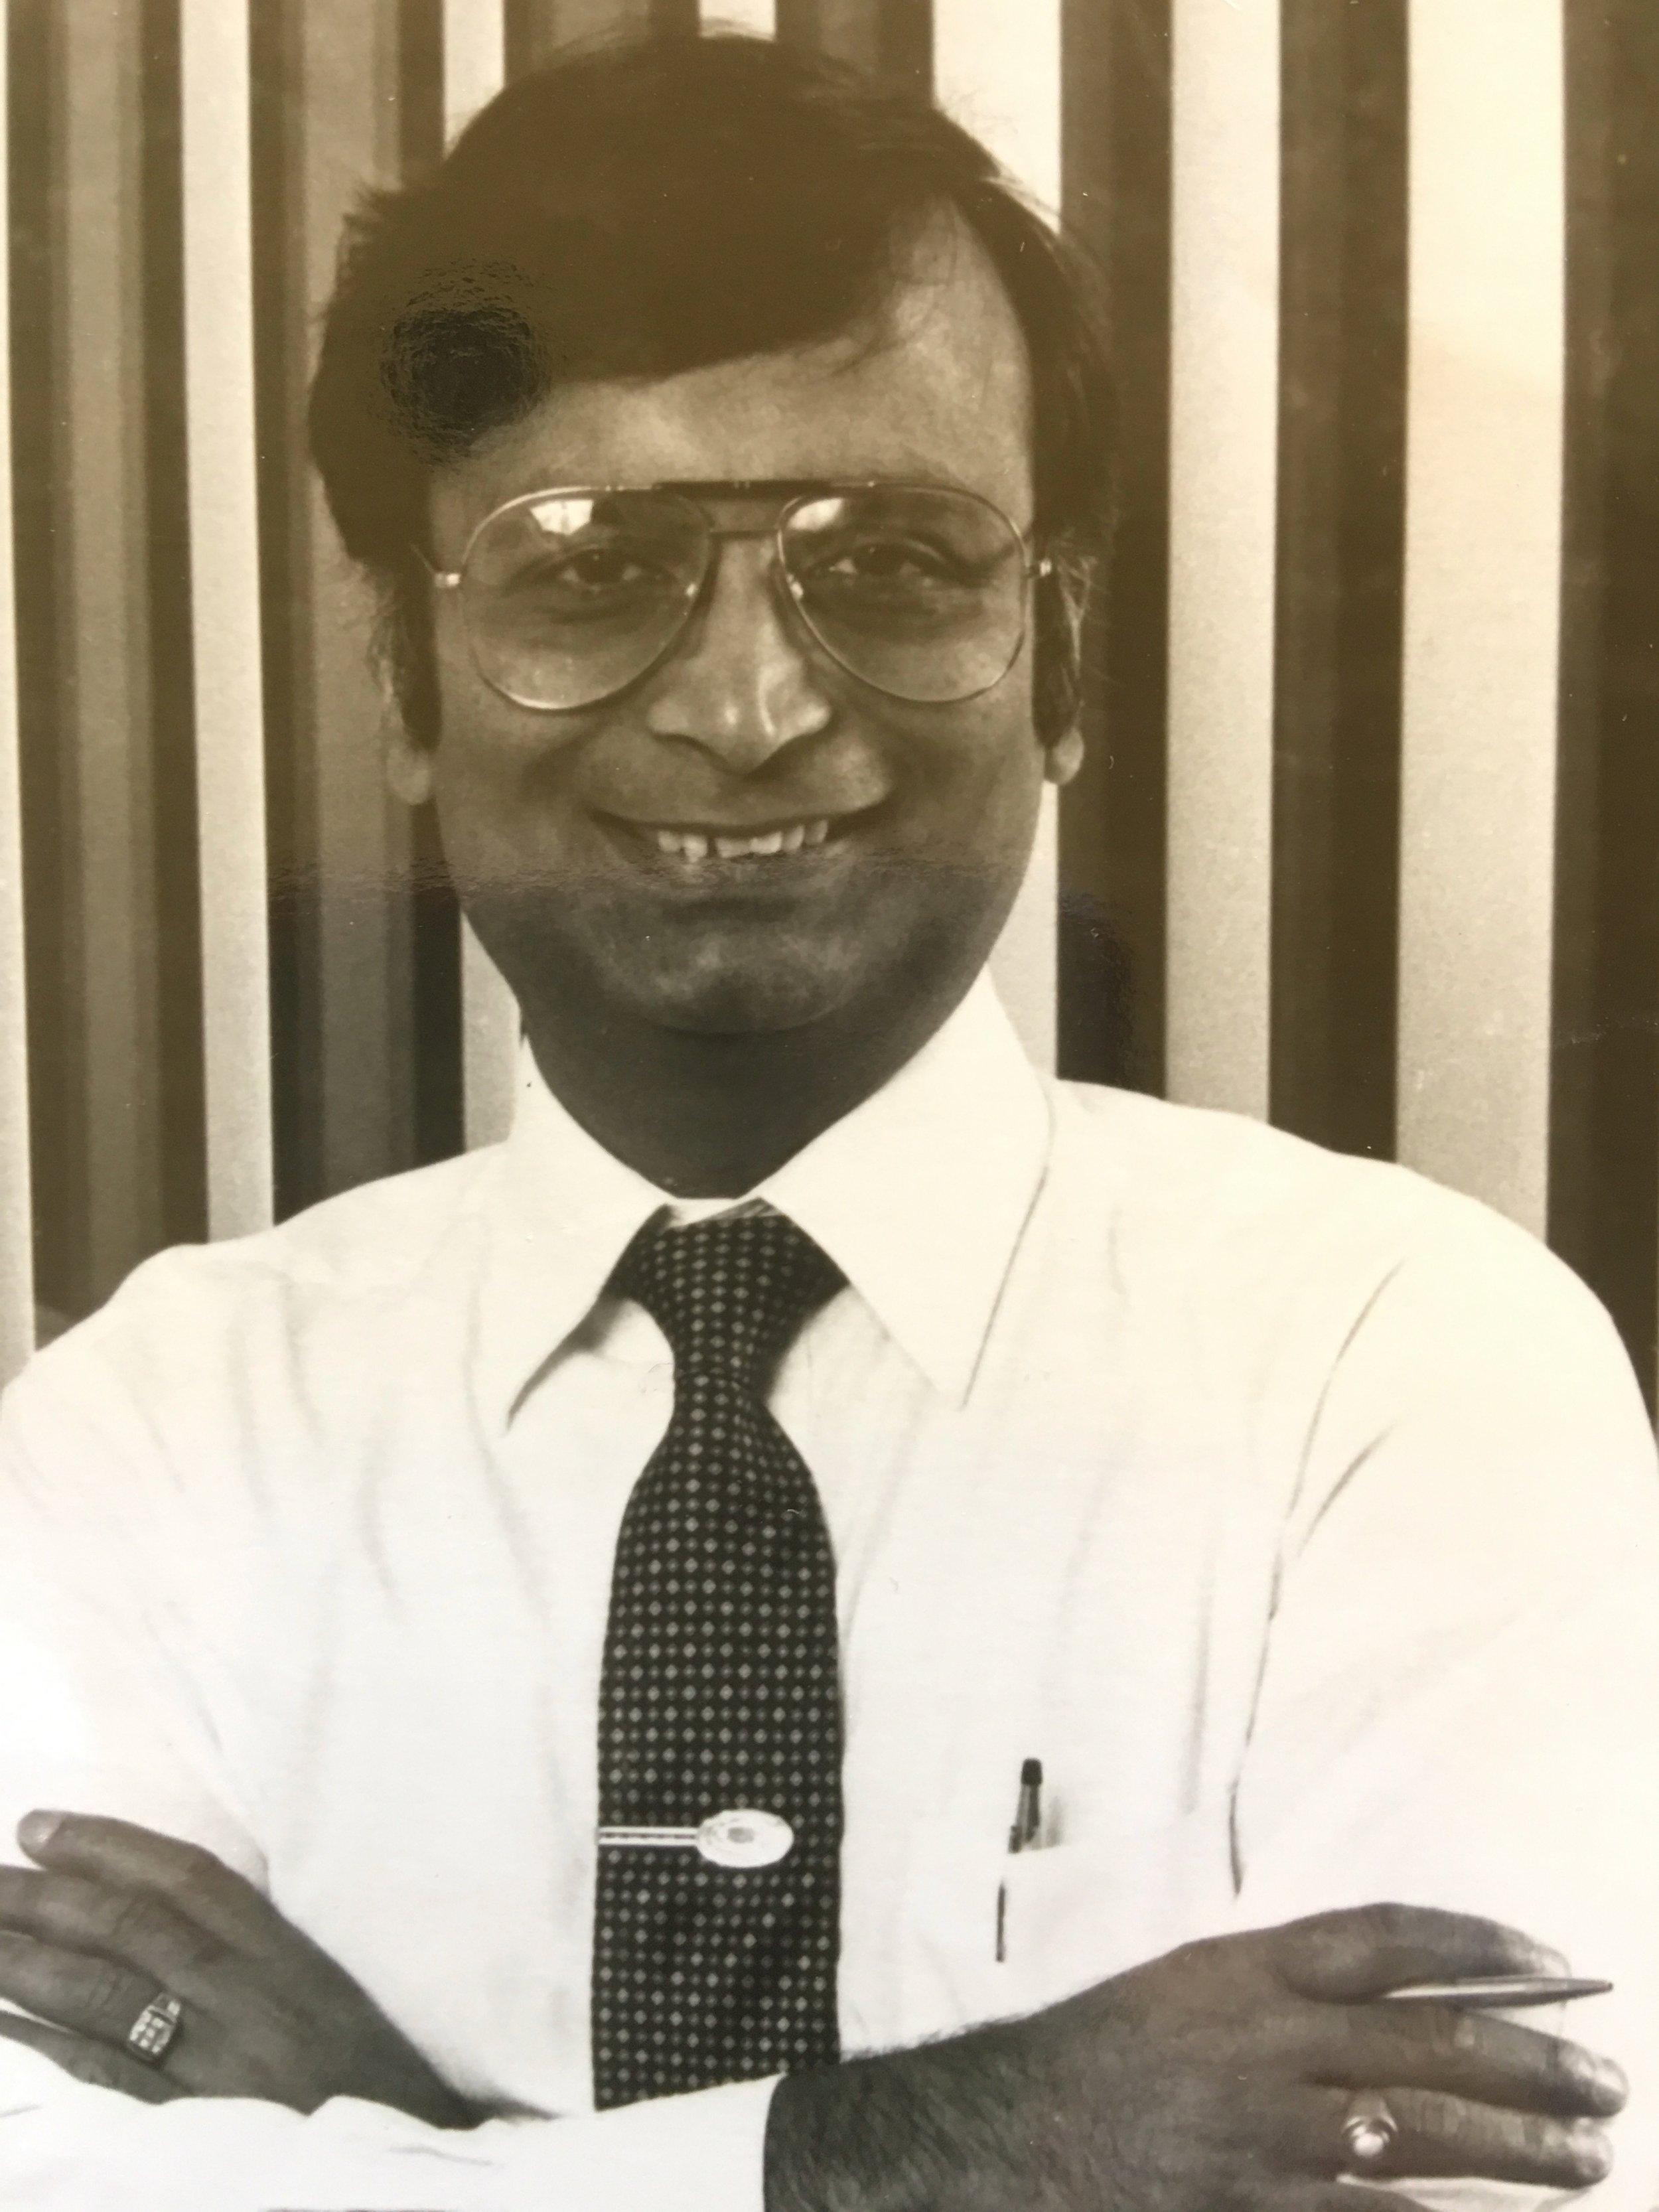 Prabhu Goel at Gateway  (Photo is provided as a courtesy to The $8 Man by Prabhu Goel)